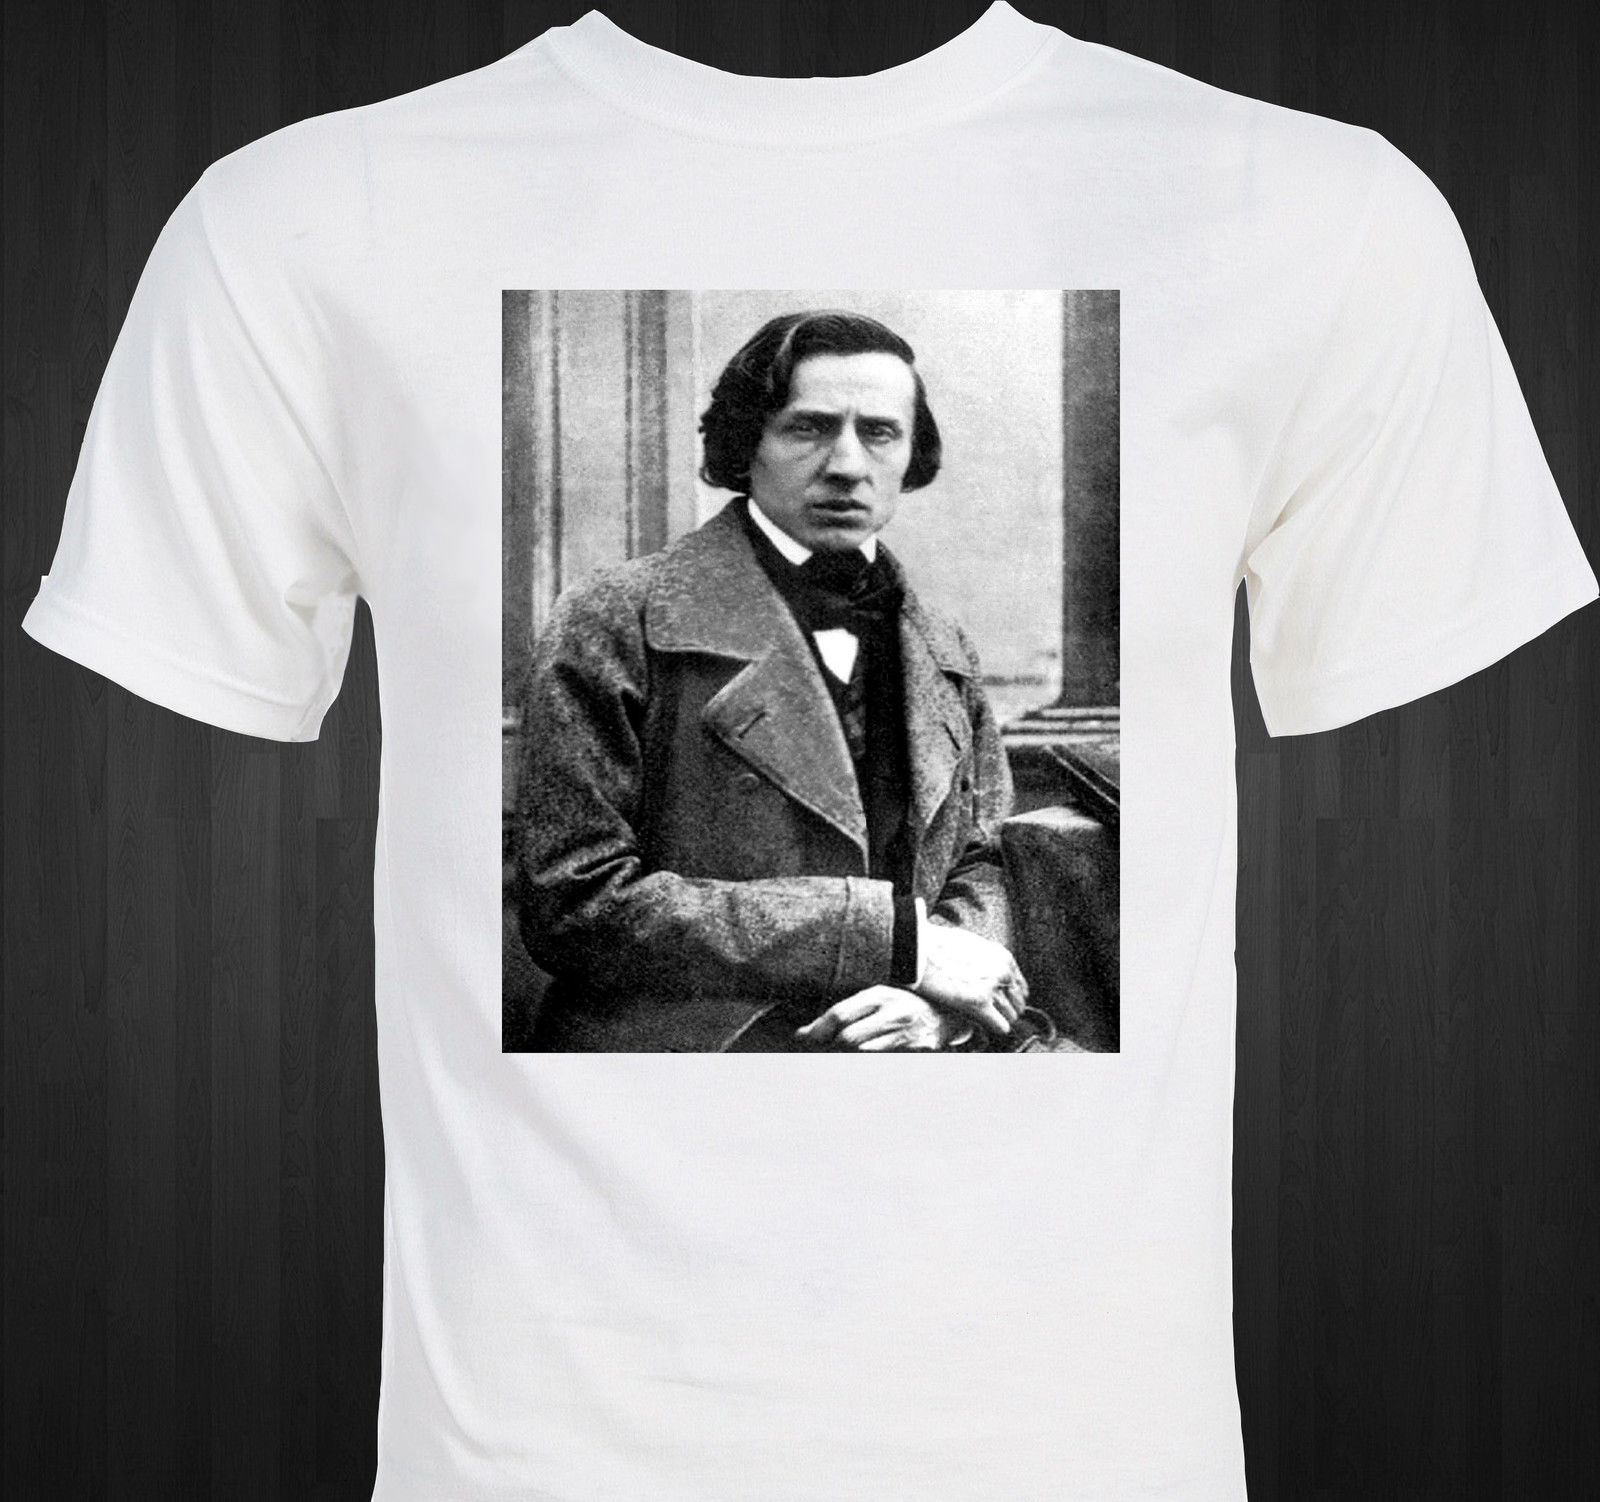 Verano 2019 algodón de 100% Normal Chopin-Frederic Chopin-clásico Composer-pianista Piano Musical t-shirtcrossfit camiseta